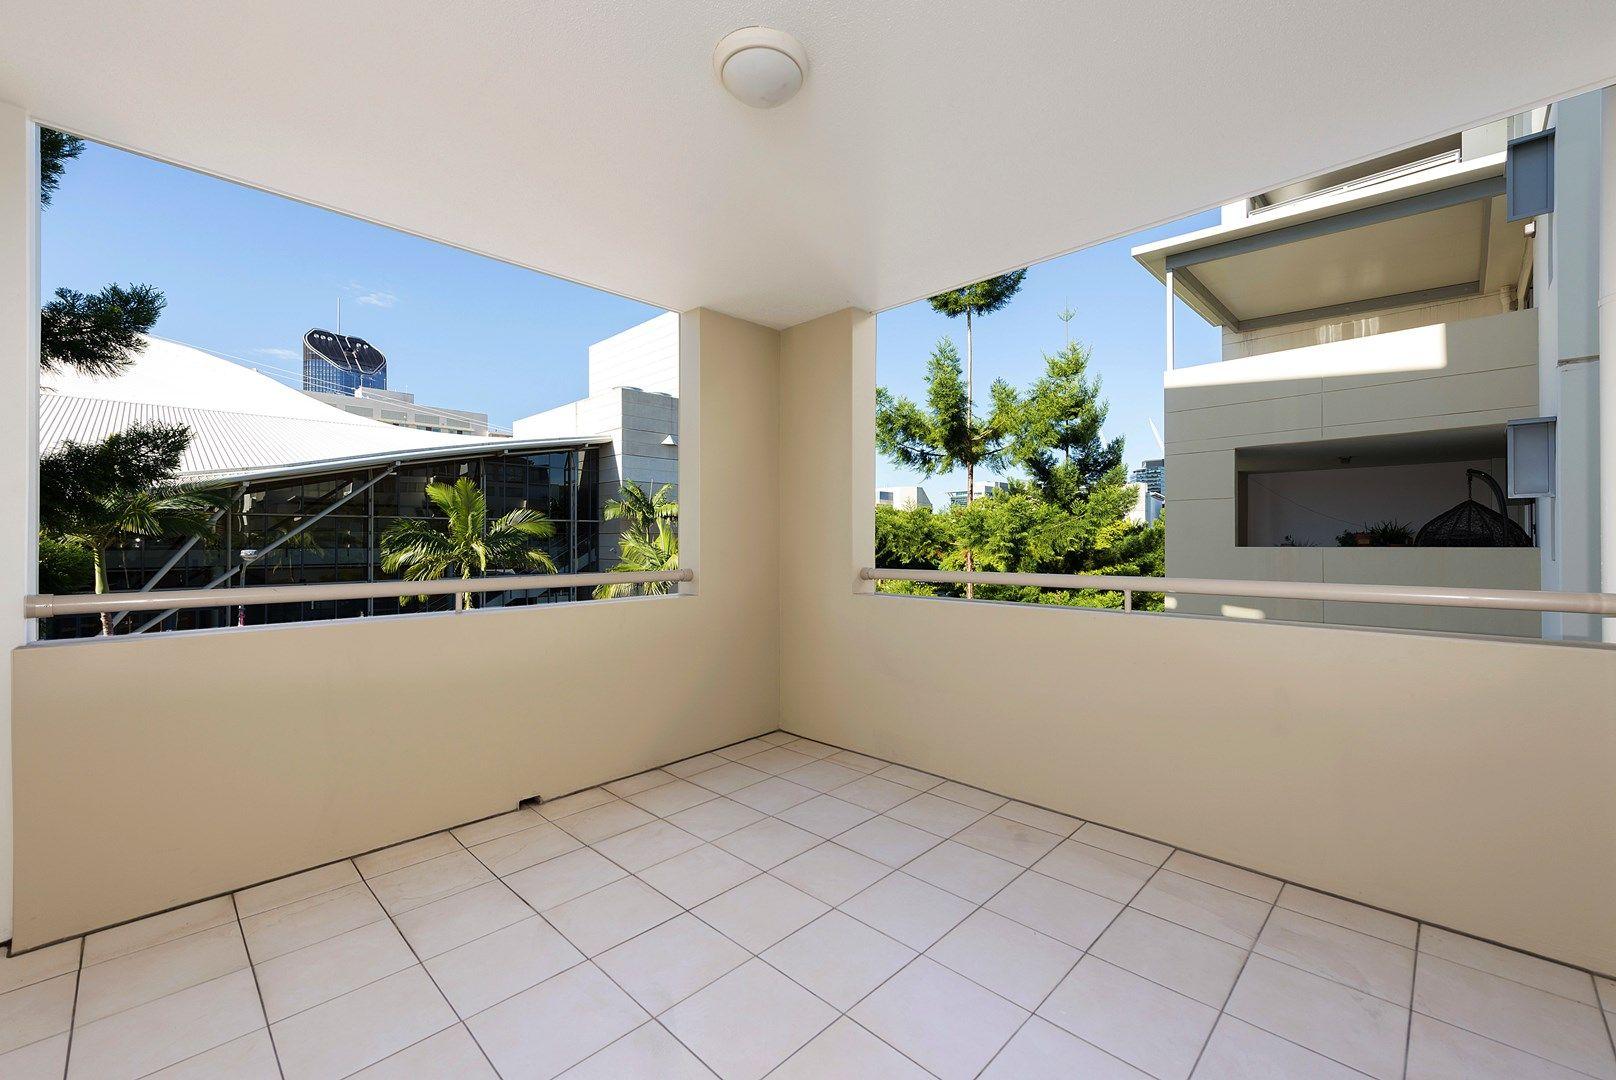 29/72 Merivale Street, South Brisbane QLD 4101, Image 0